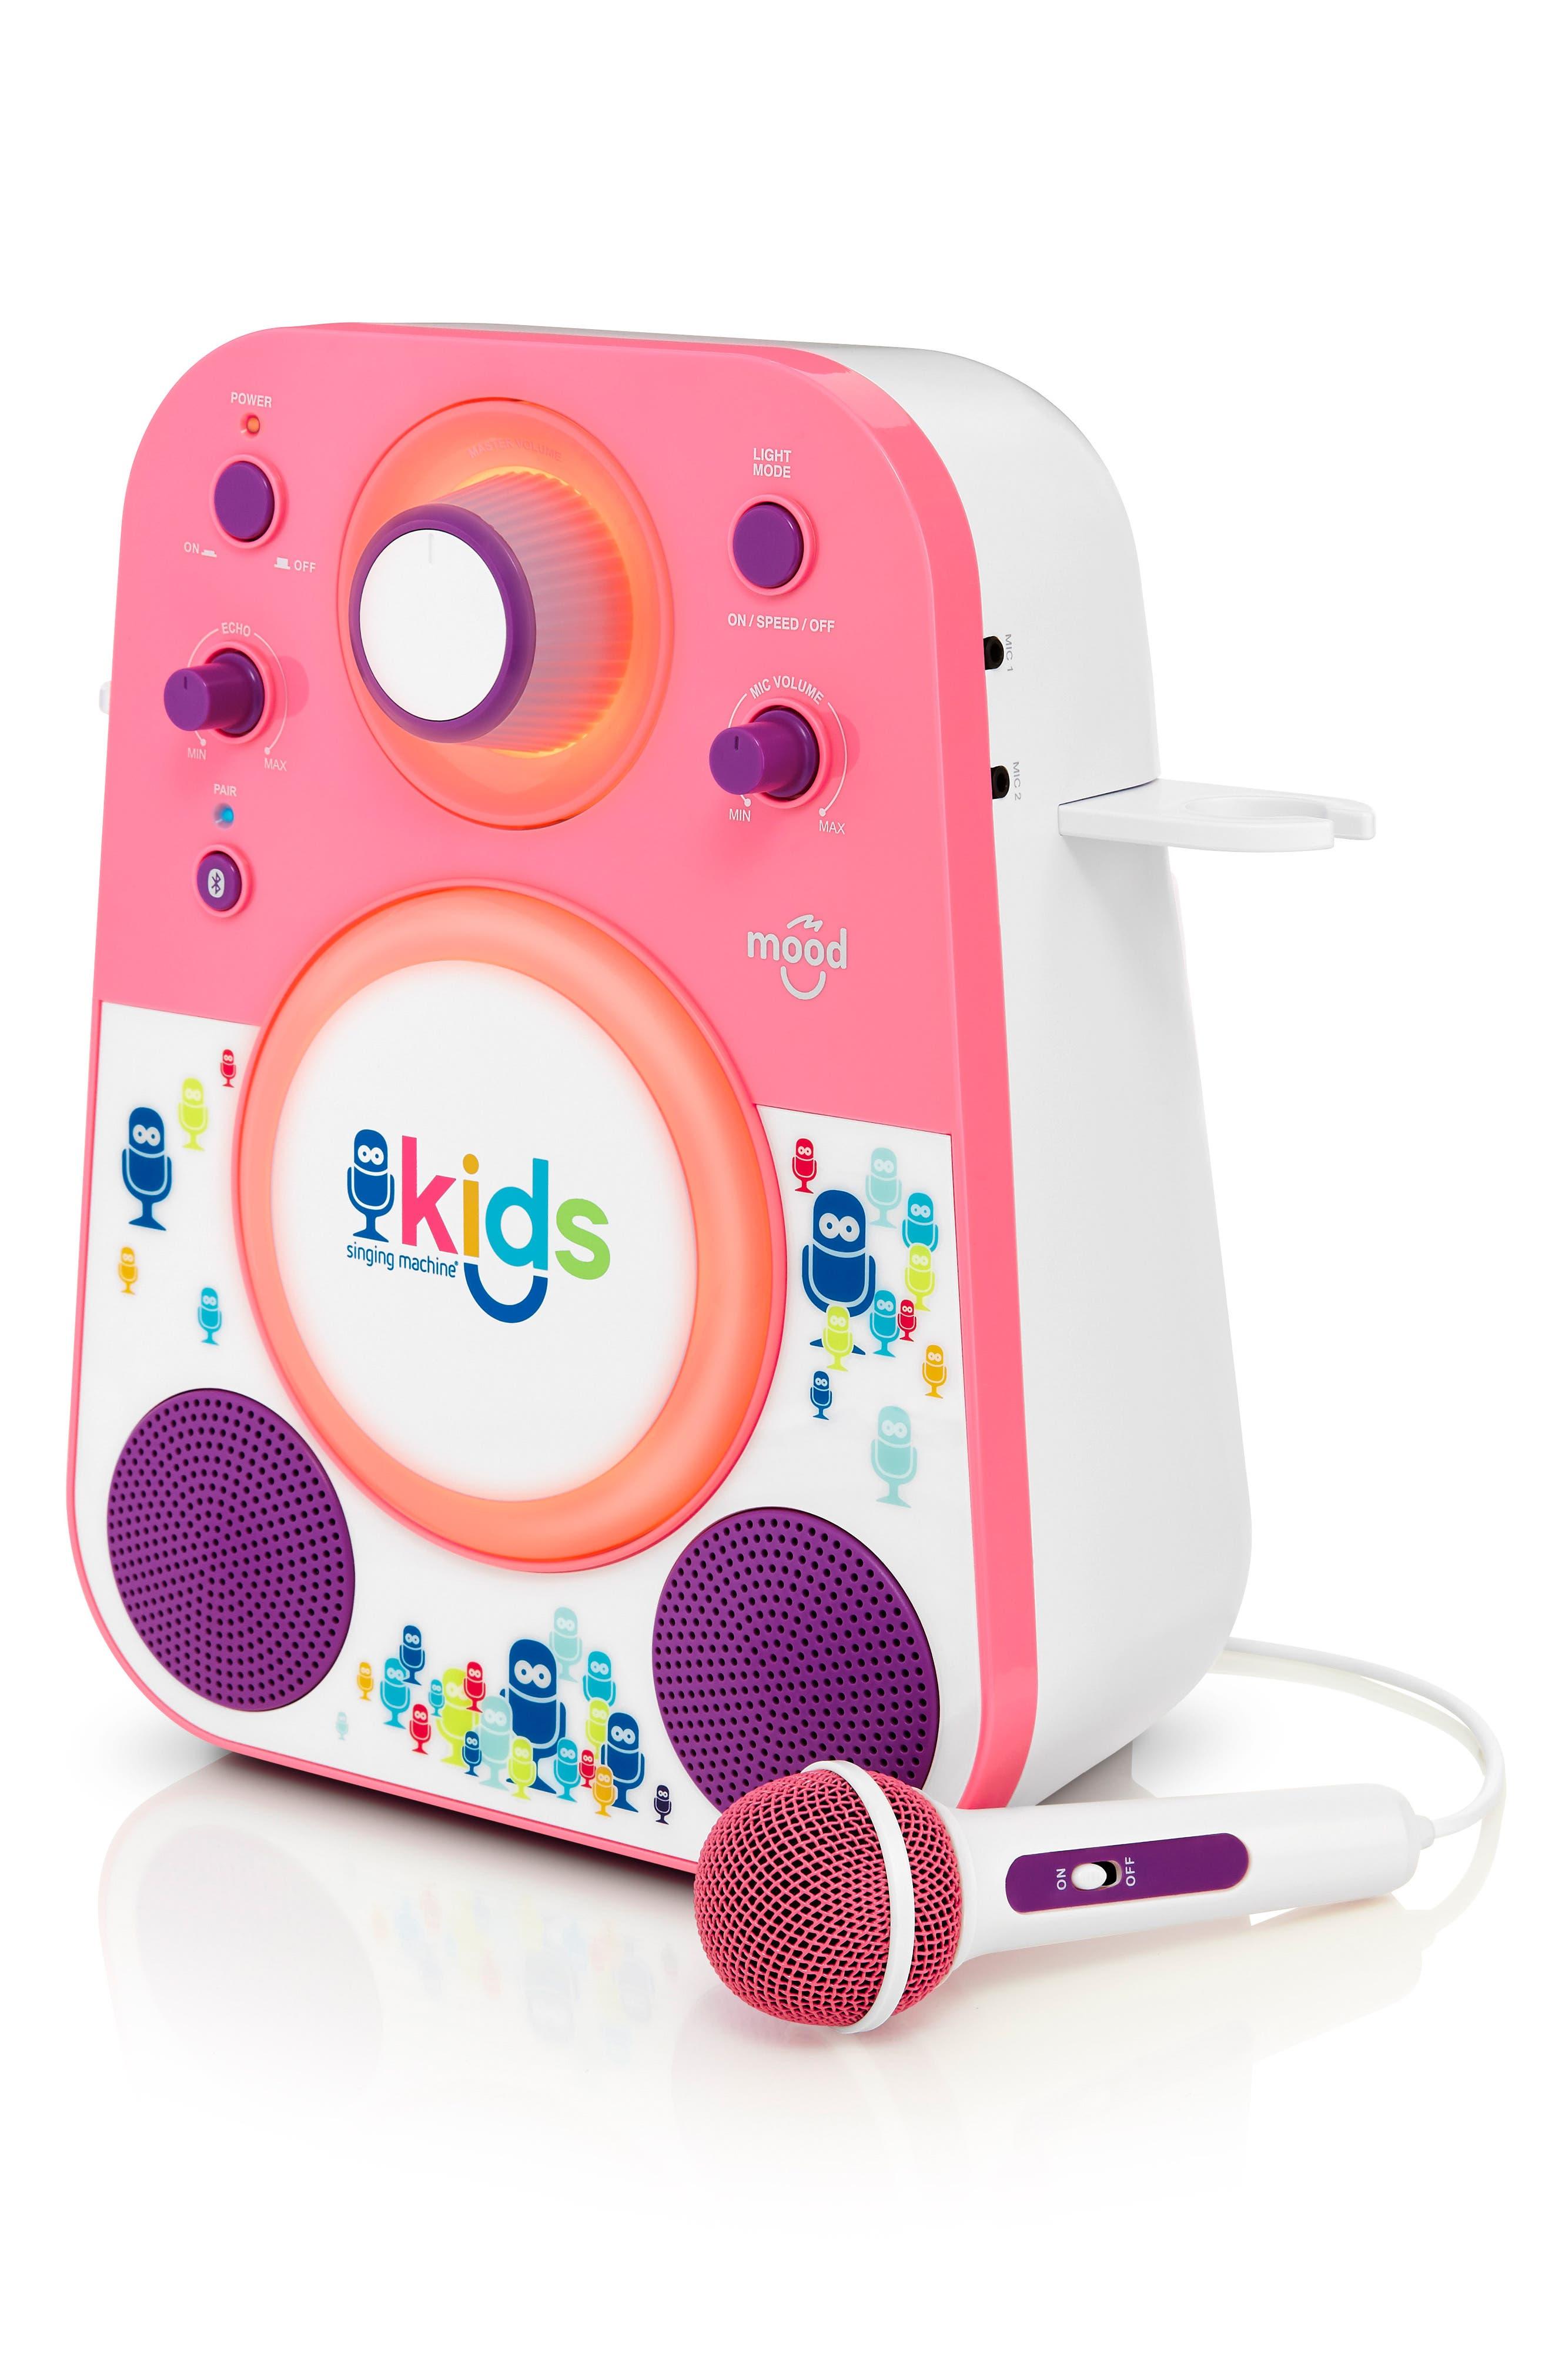 Kids Mood Karaoke System,                             Alternate thumbnail 5, color,                             PINK PURPLE